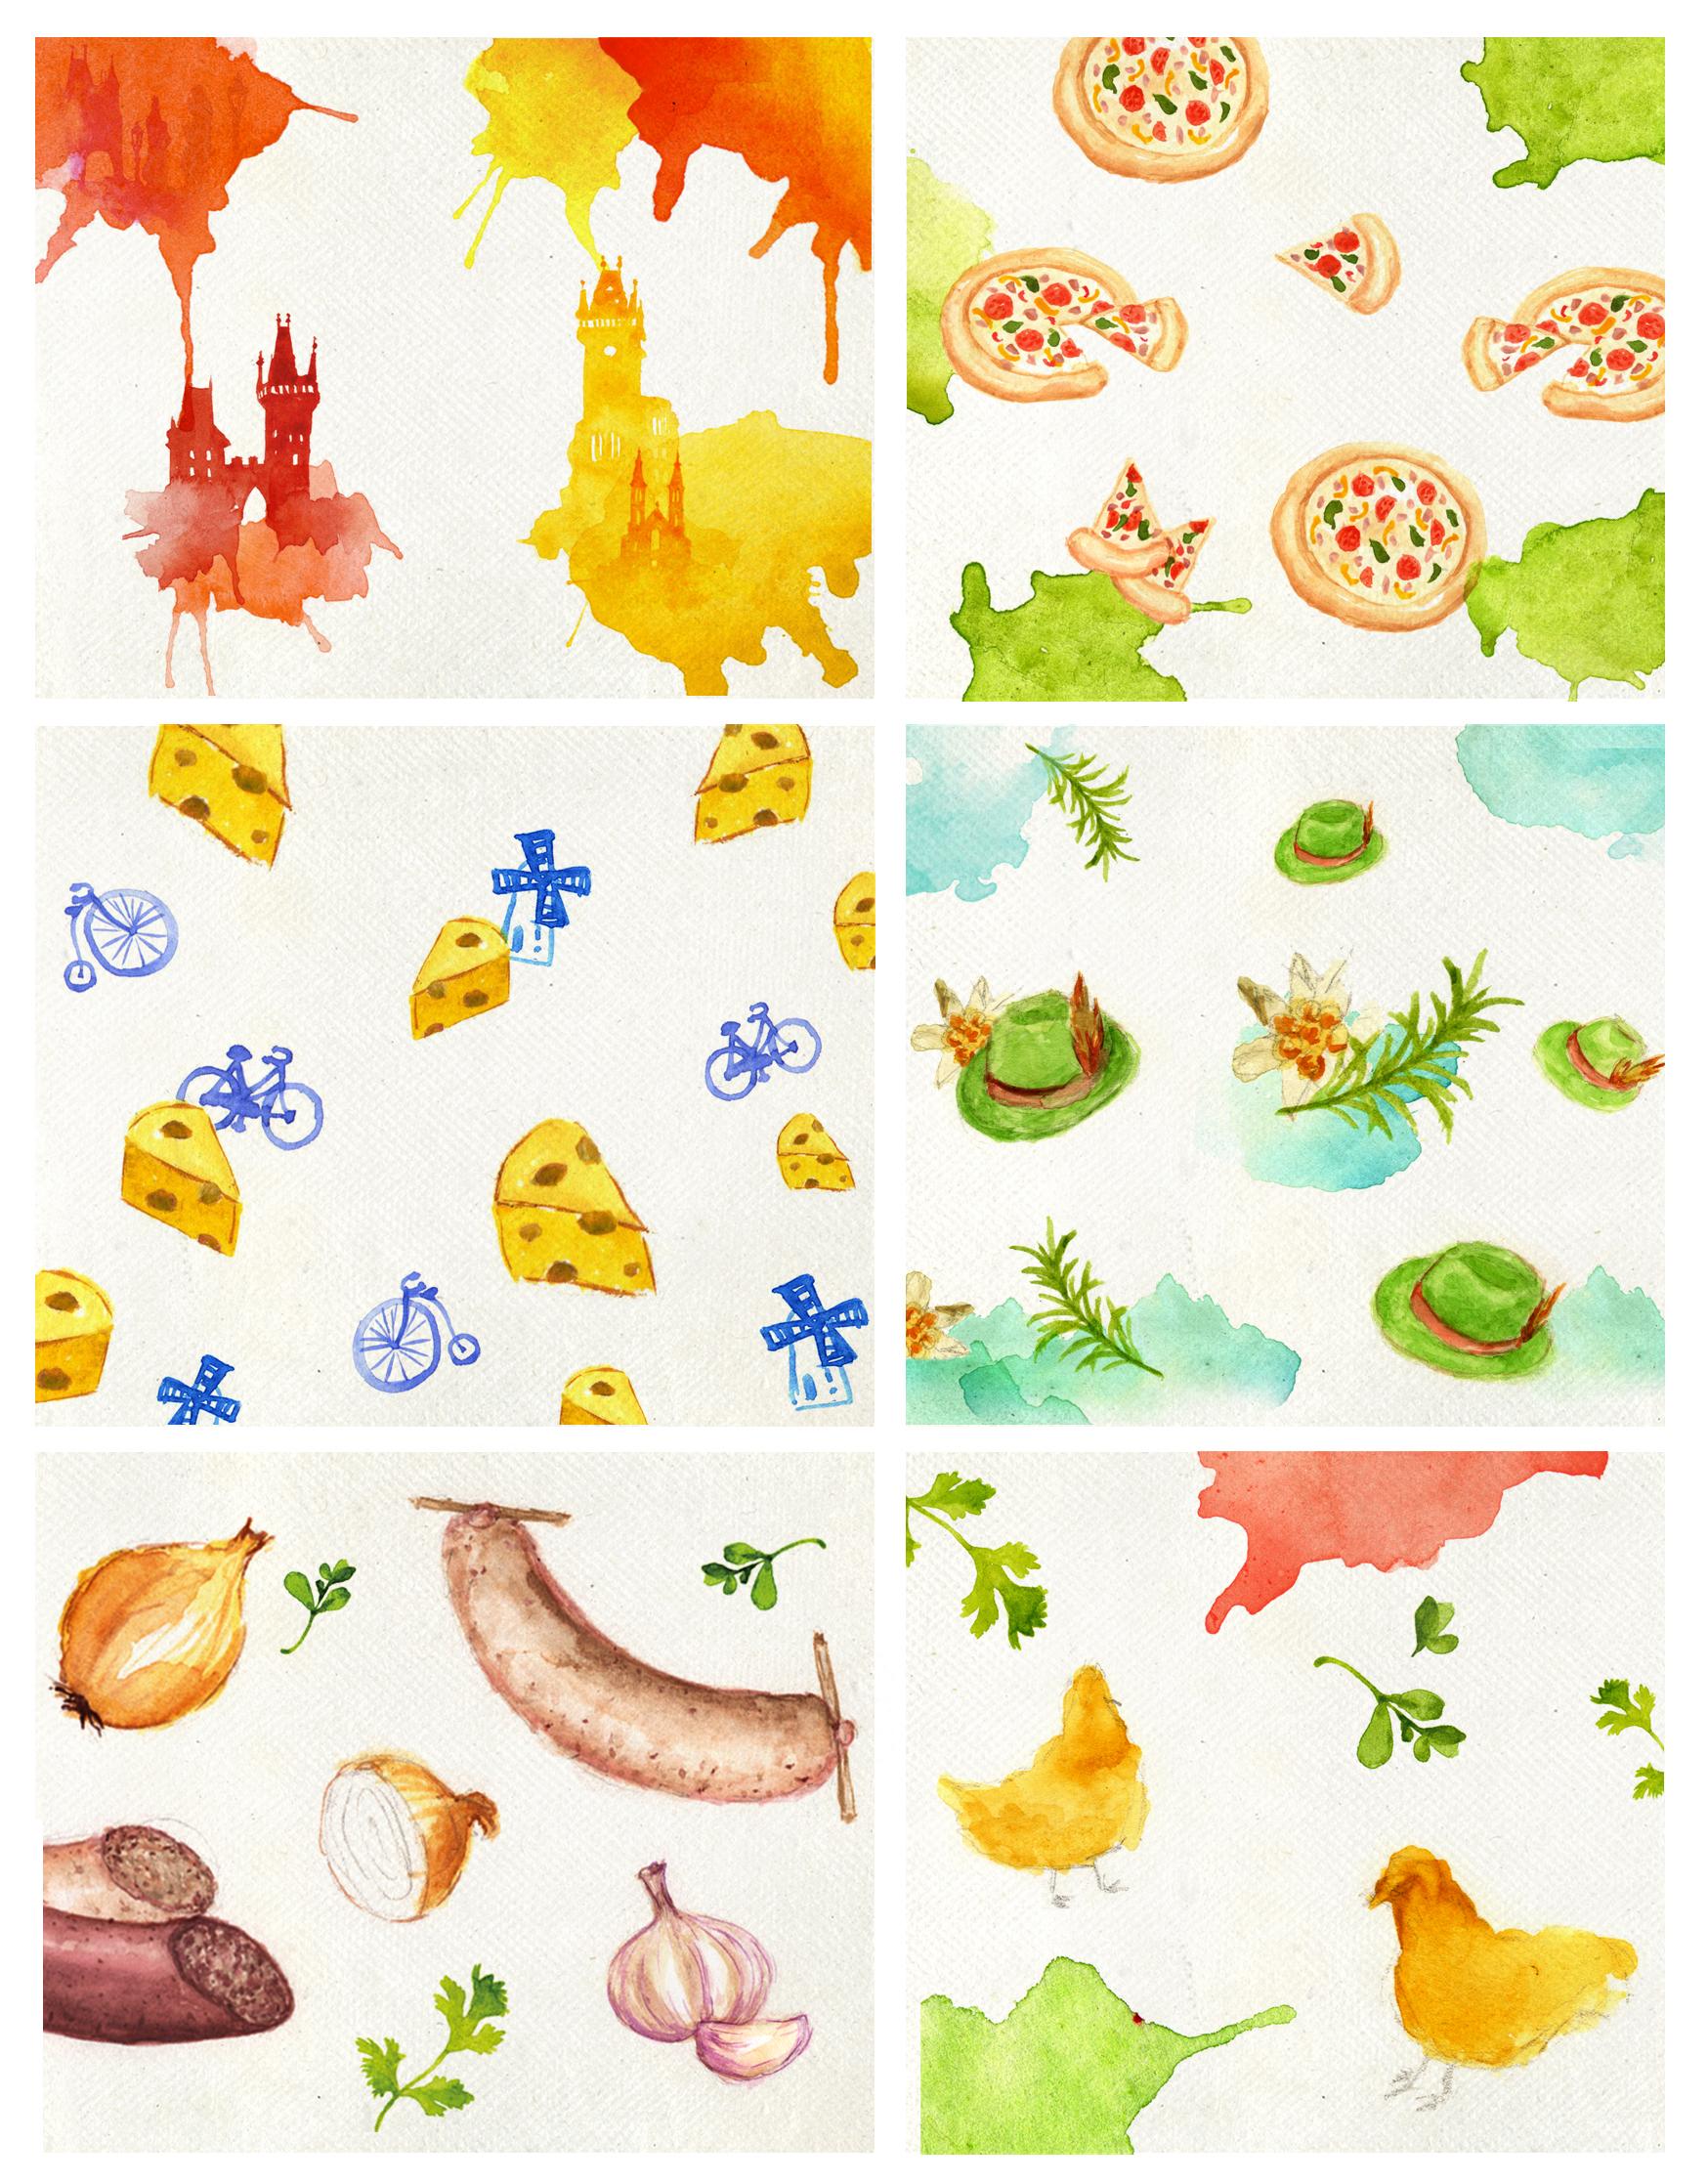 kate varady_watercolor illustrations